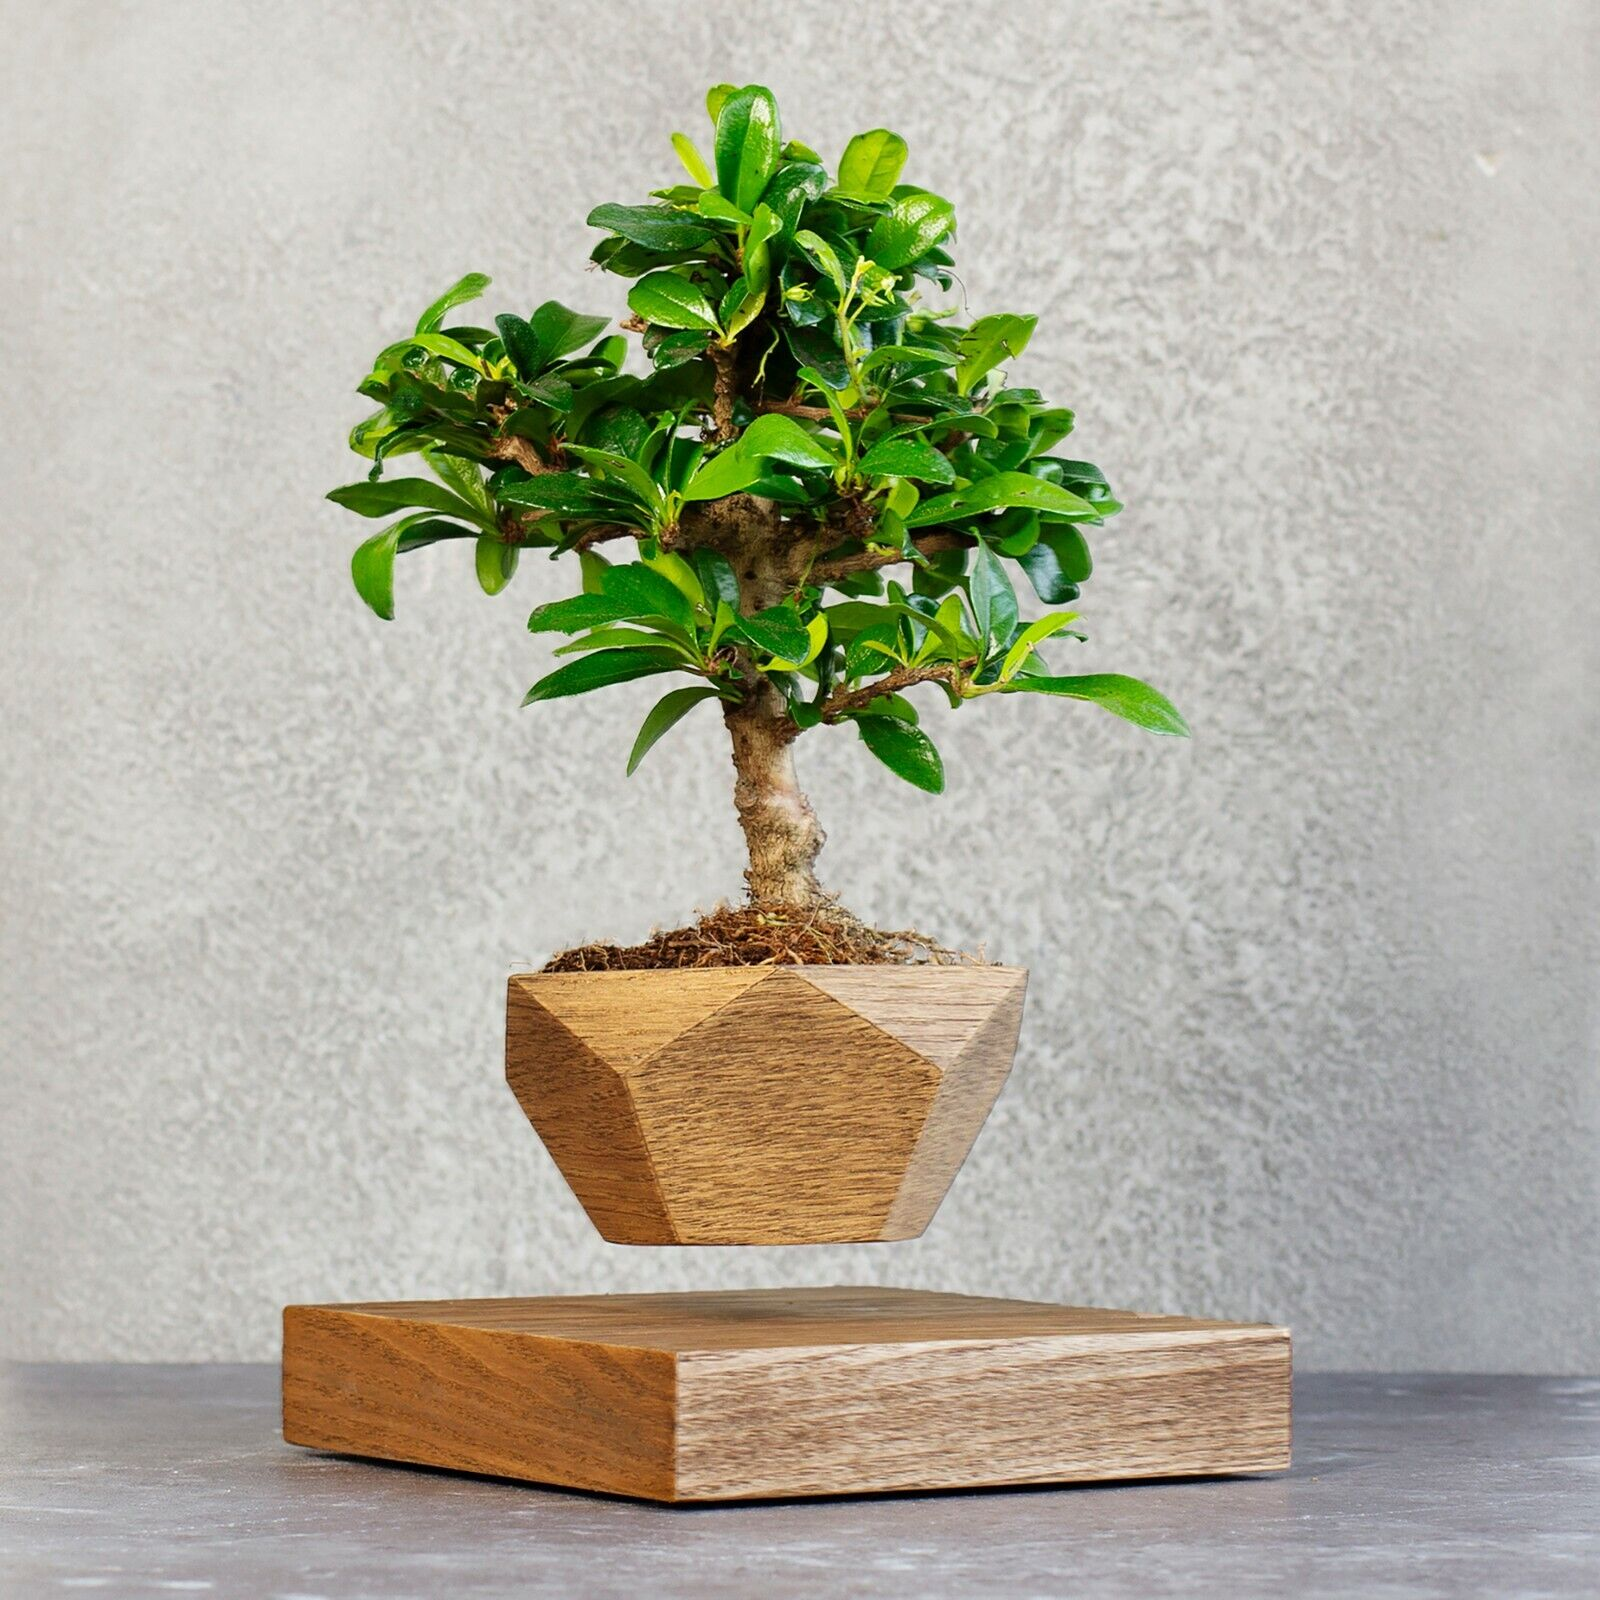 Levitating Bonsai Wooden Pot Walnut For Sale Online